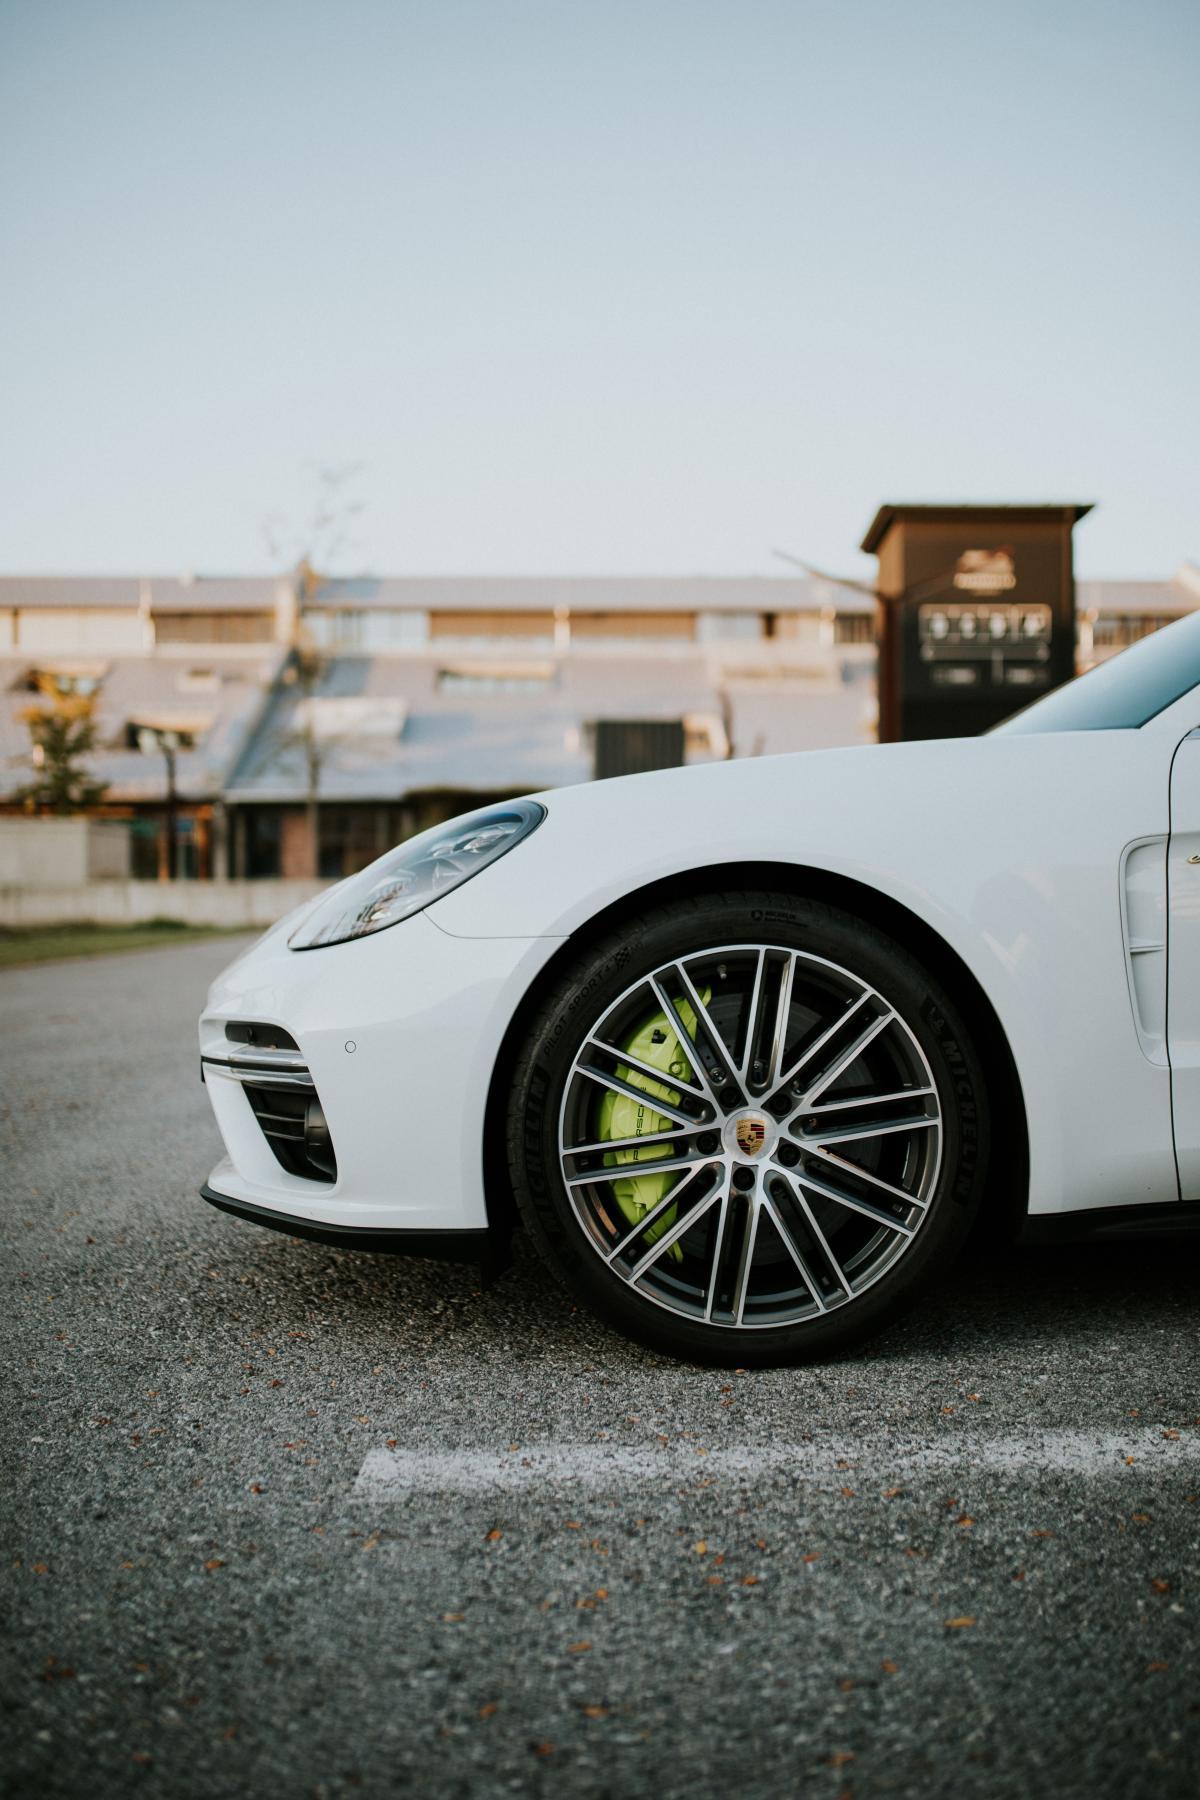 Car Wheel Auto